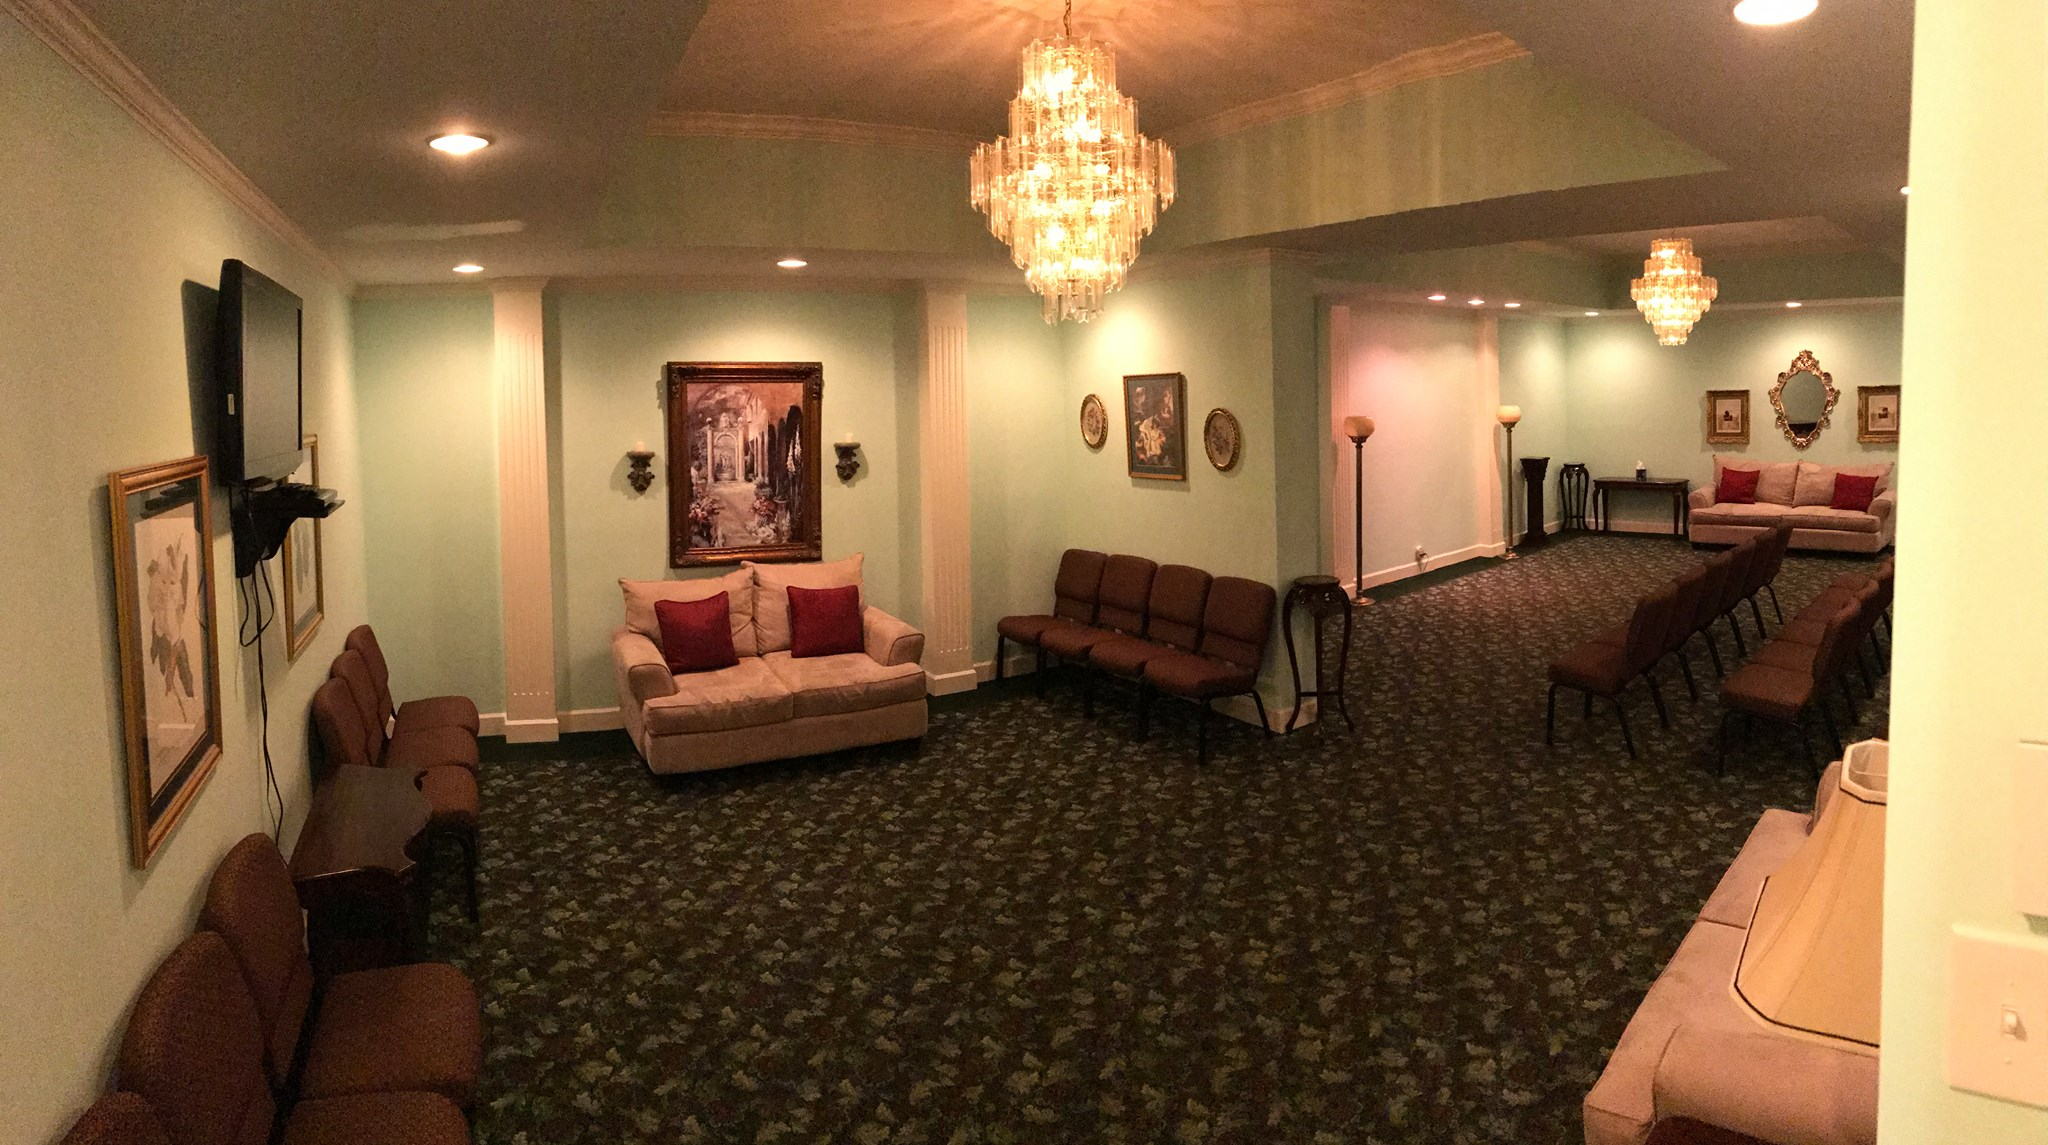 Ellis Funeral Home & Cremation Service